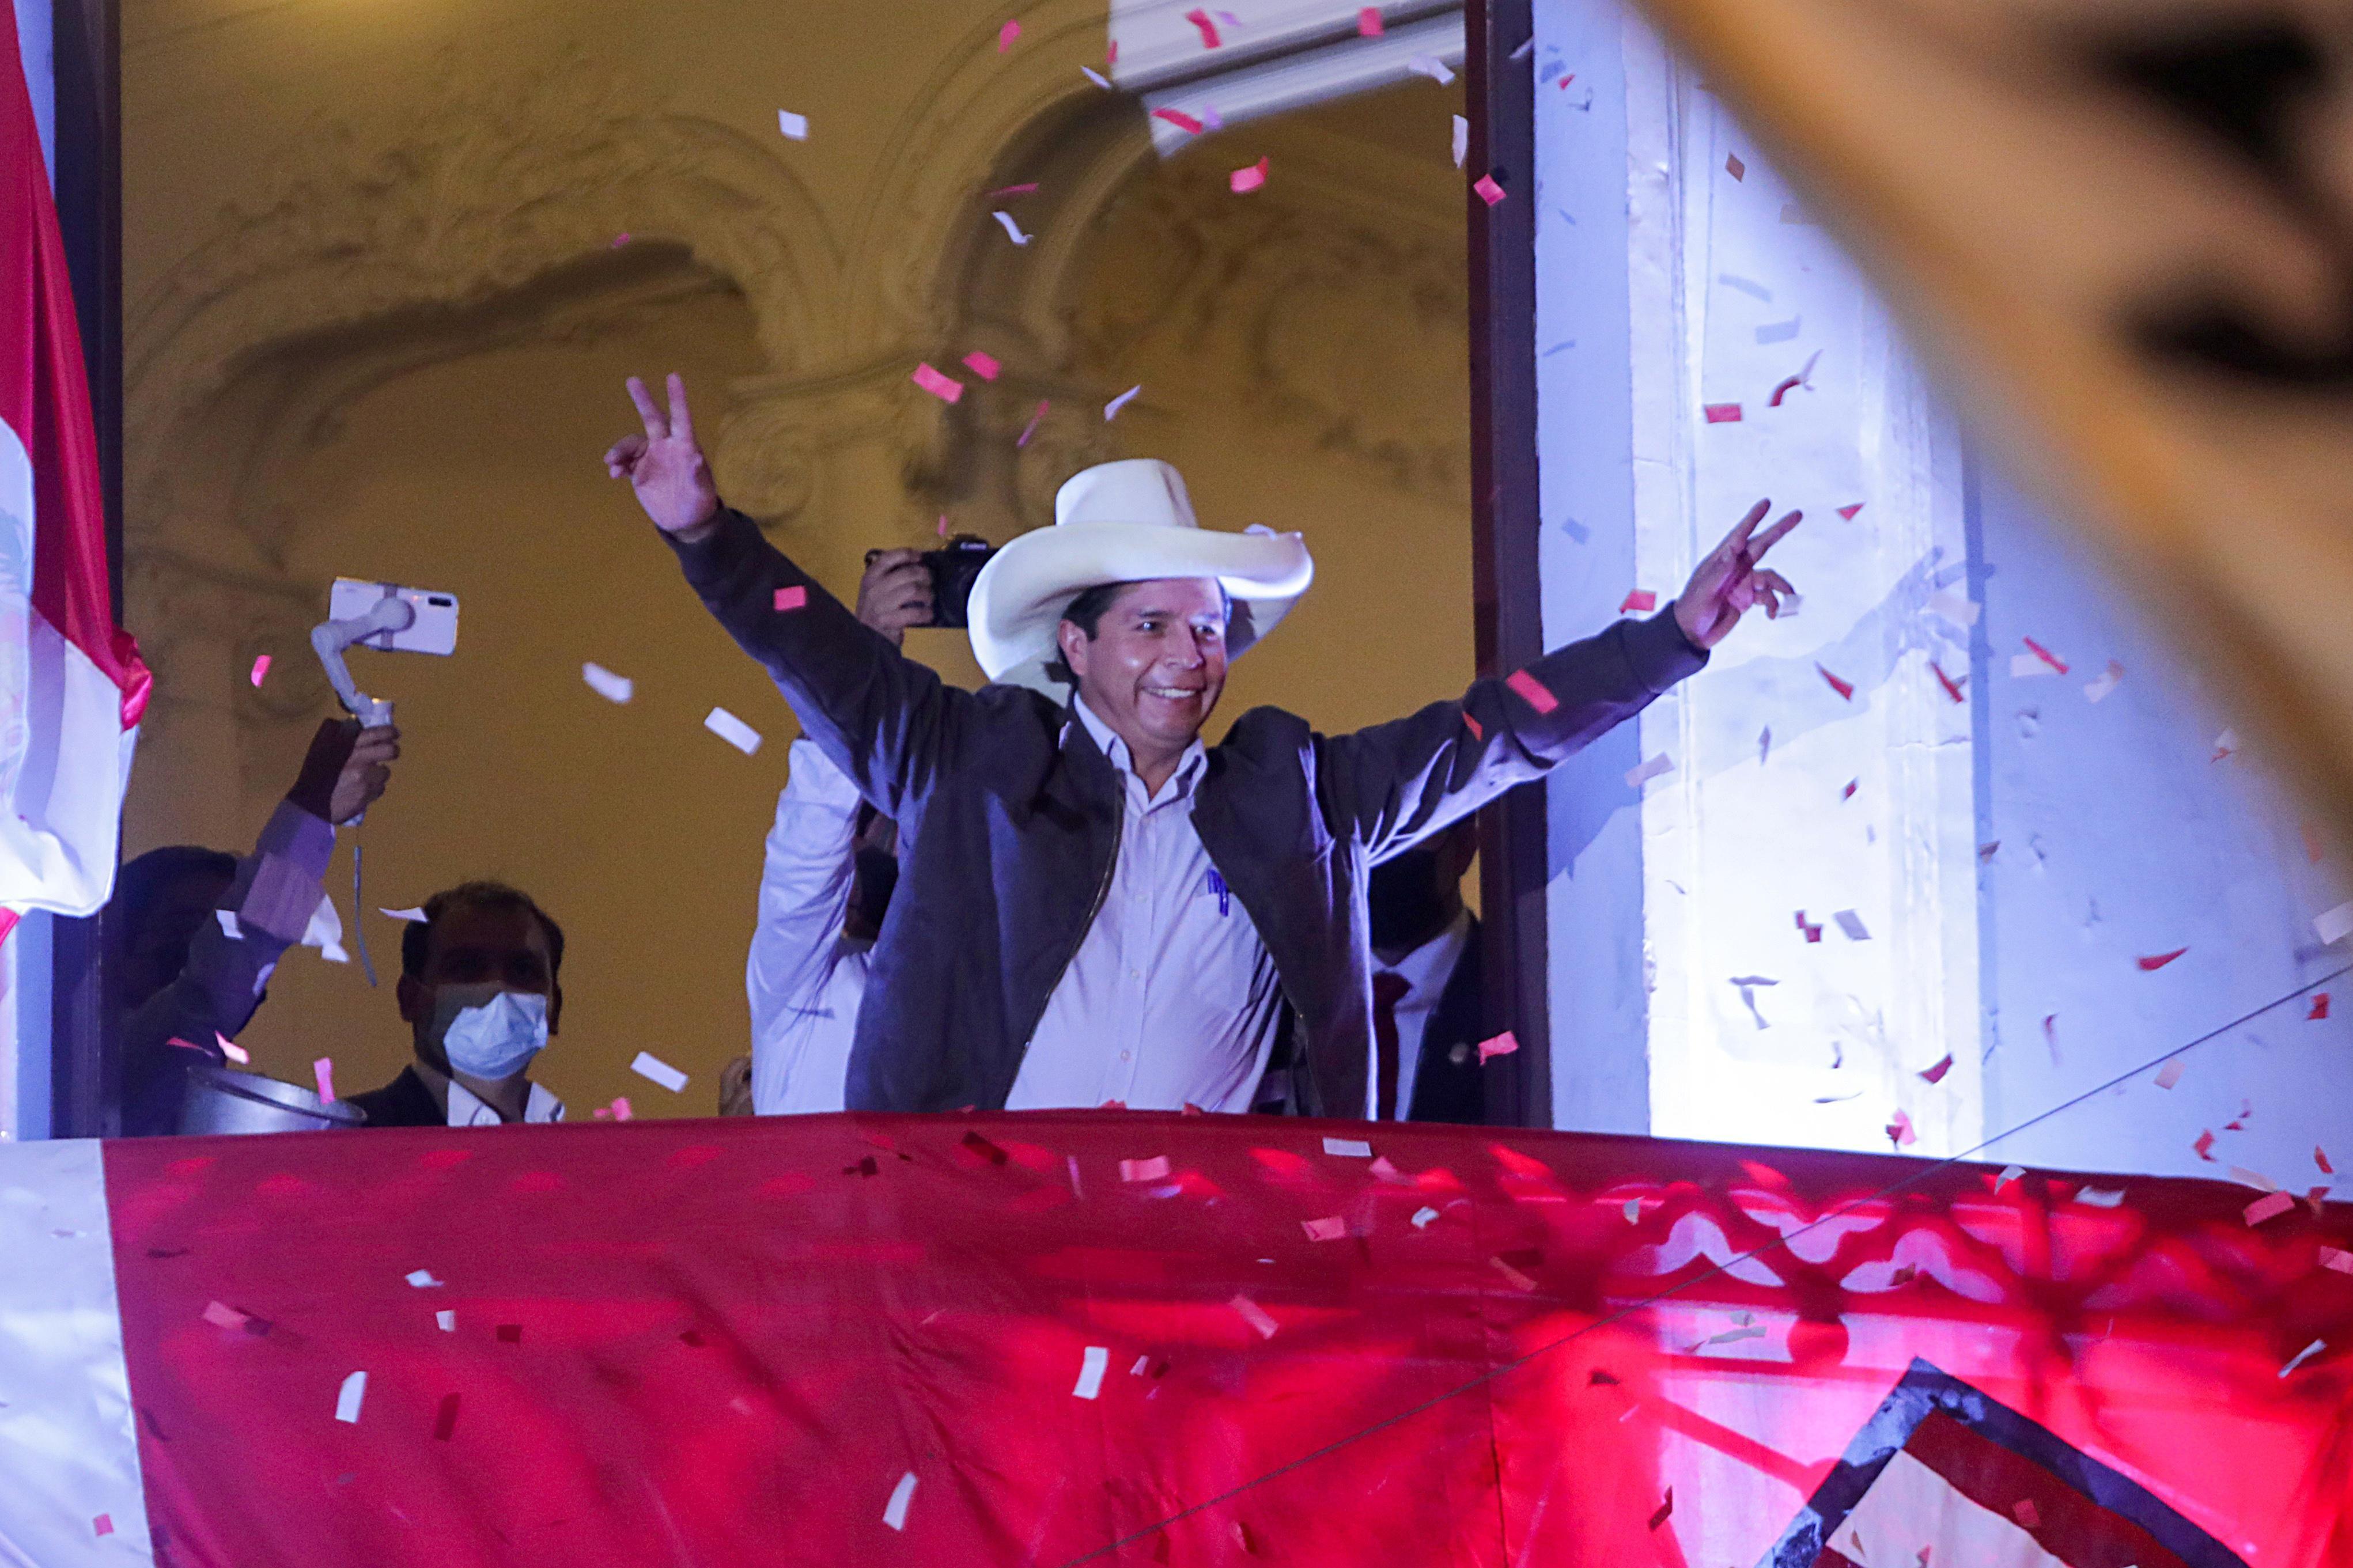 Hard Numbers: Peruvian vote count ends, Israel-Hamas violence again, China denies radiation leak, EU blocks top banks' bond sales